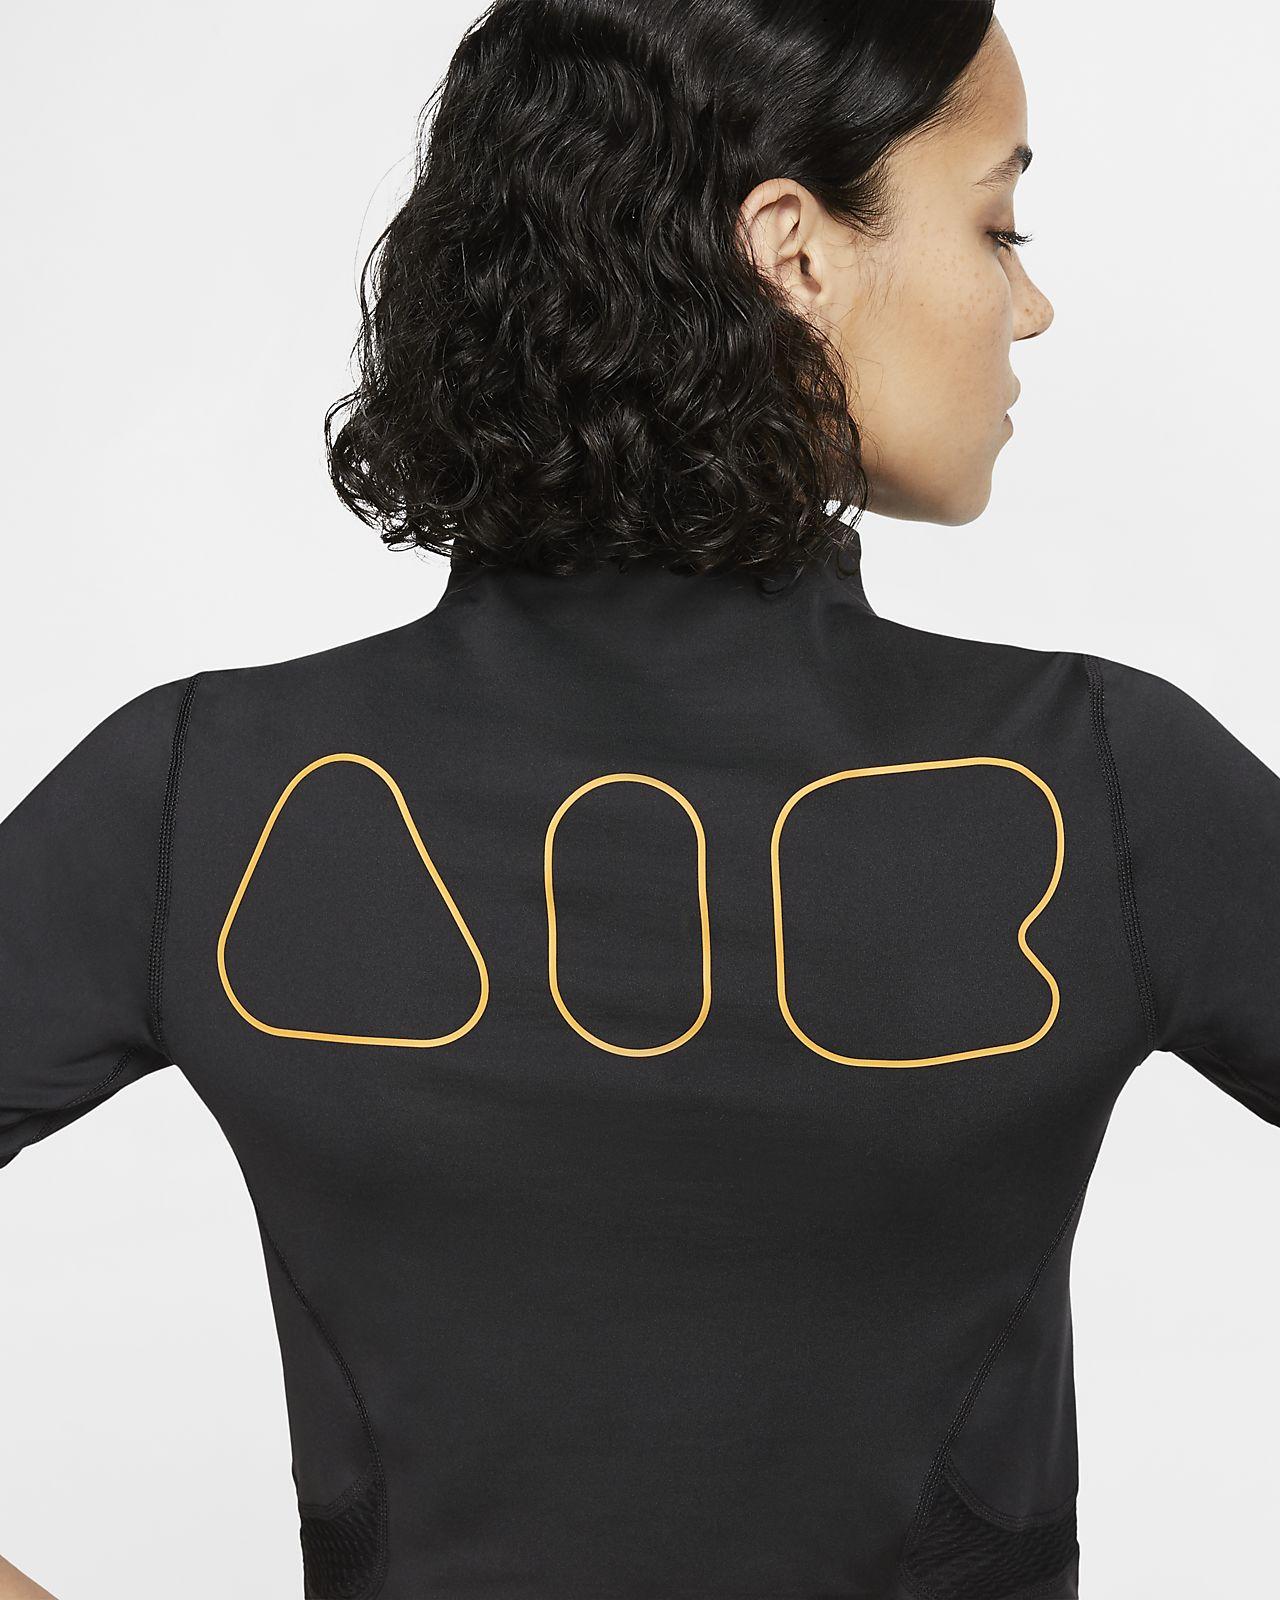 Nike Women's Short-Sleeve Running Top